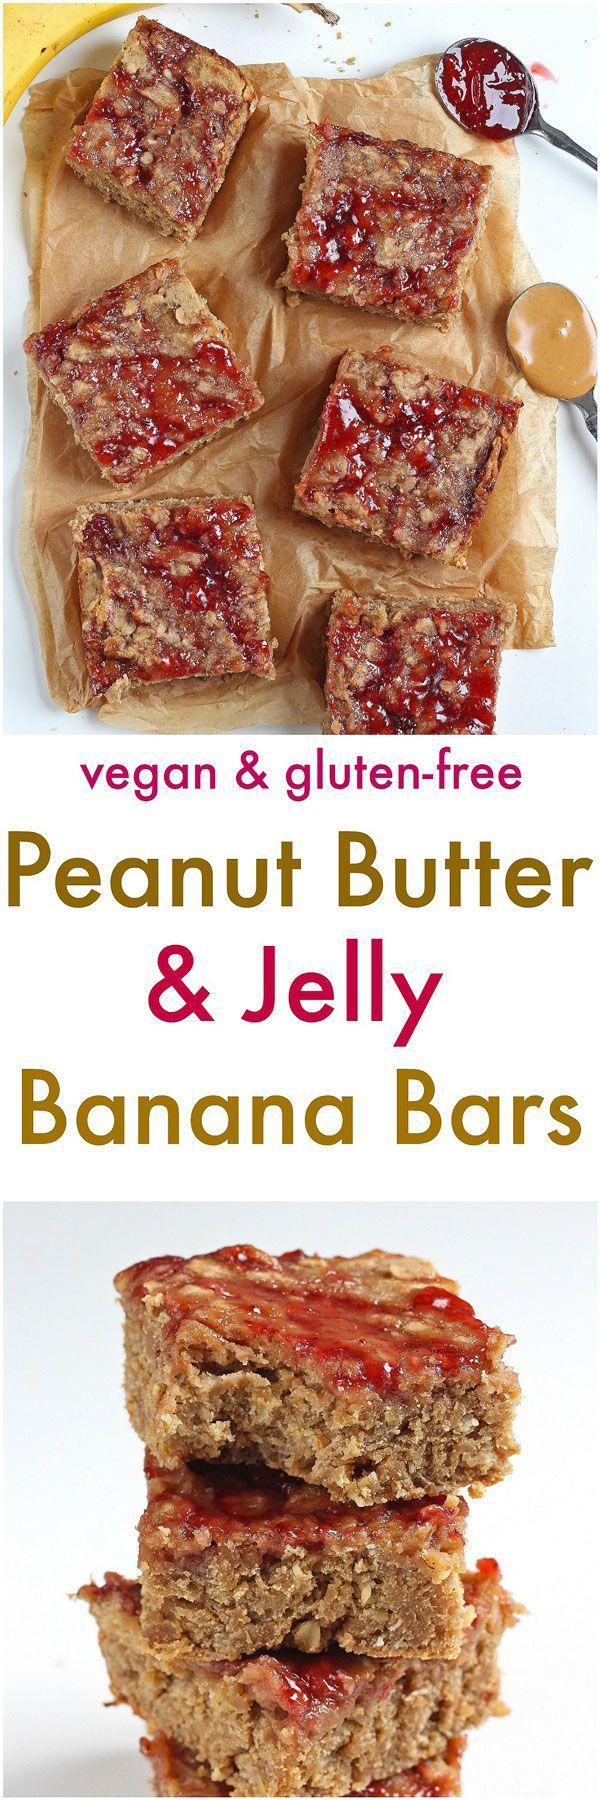 Peanut Butter and Jelly Banana Bars